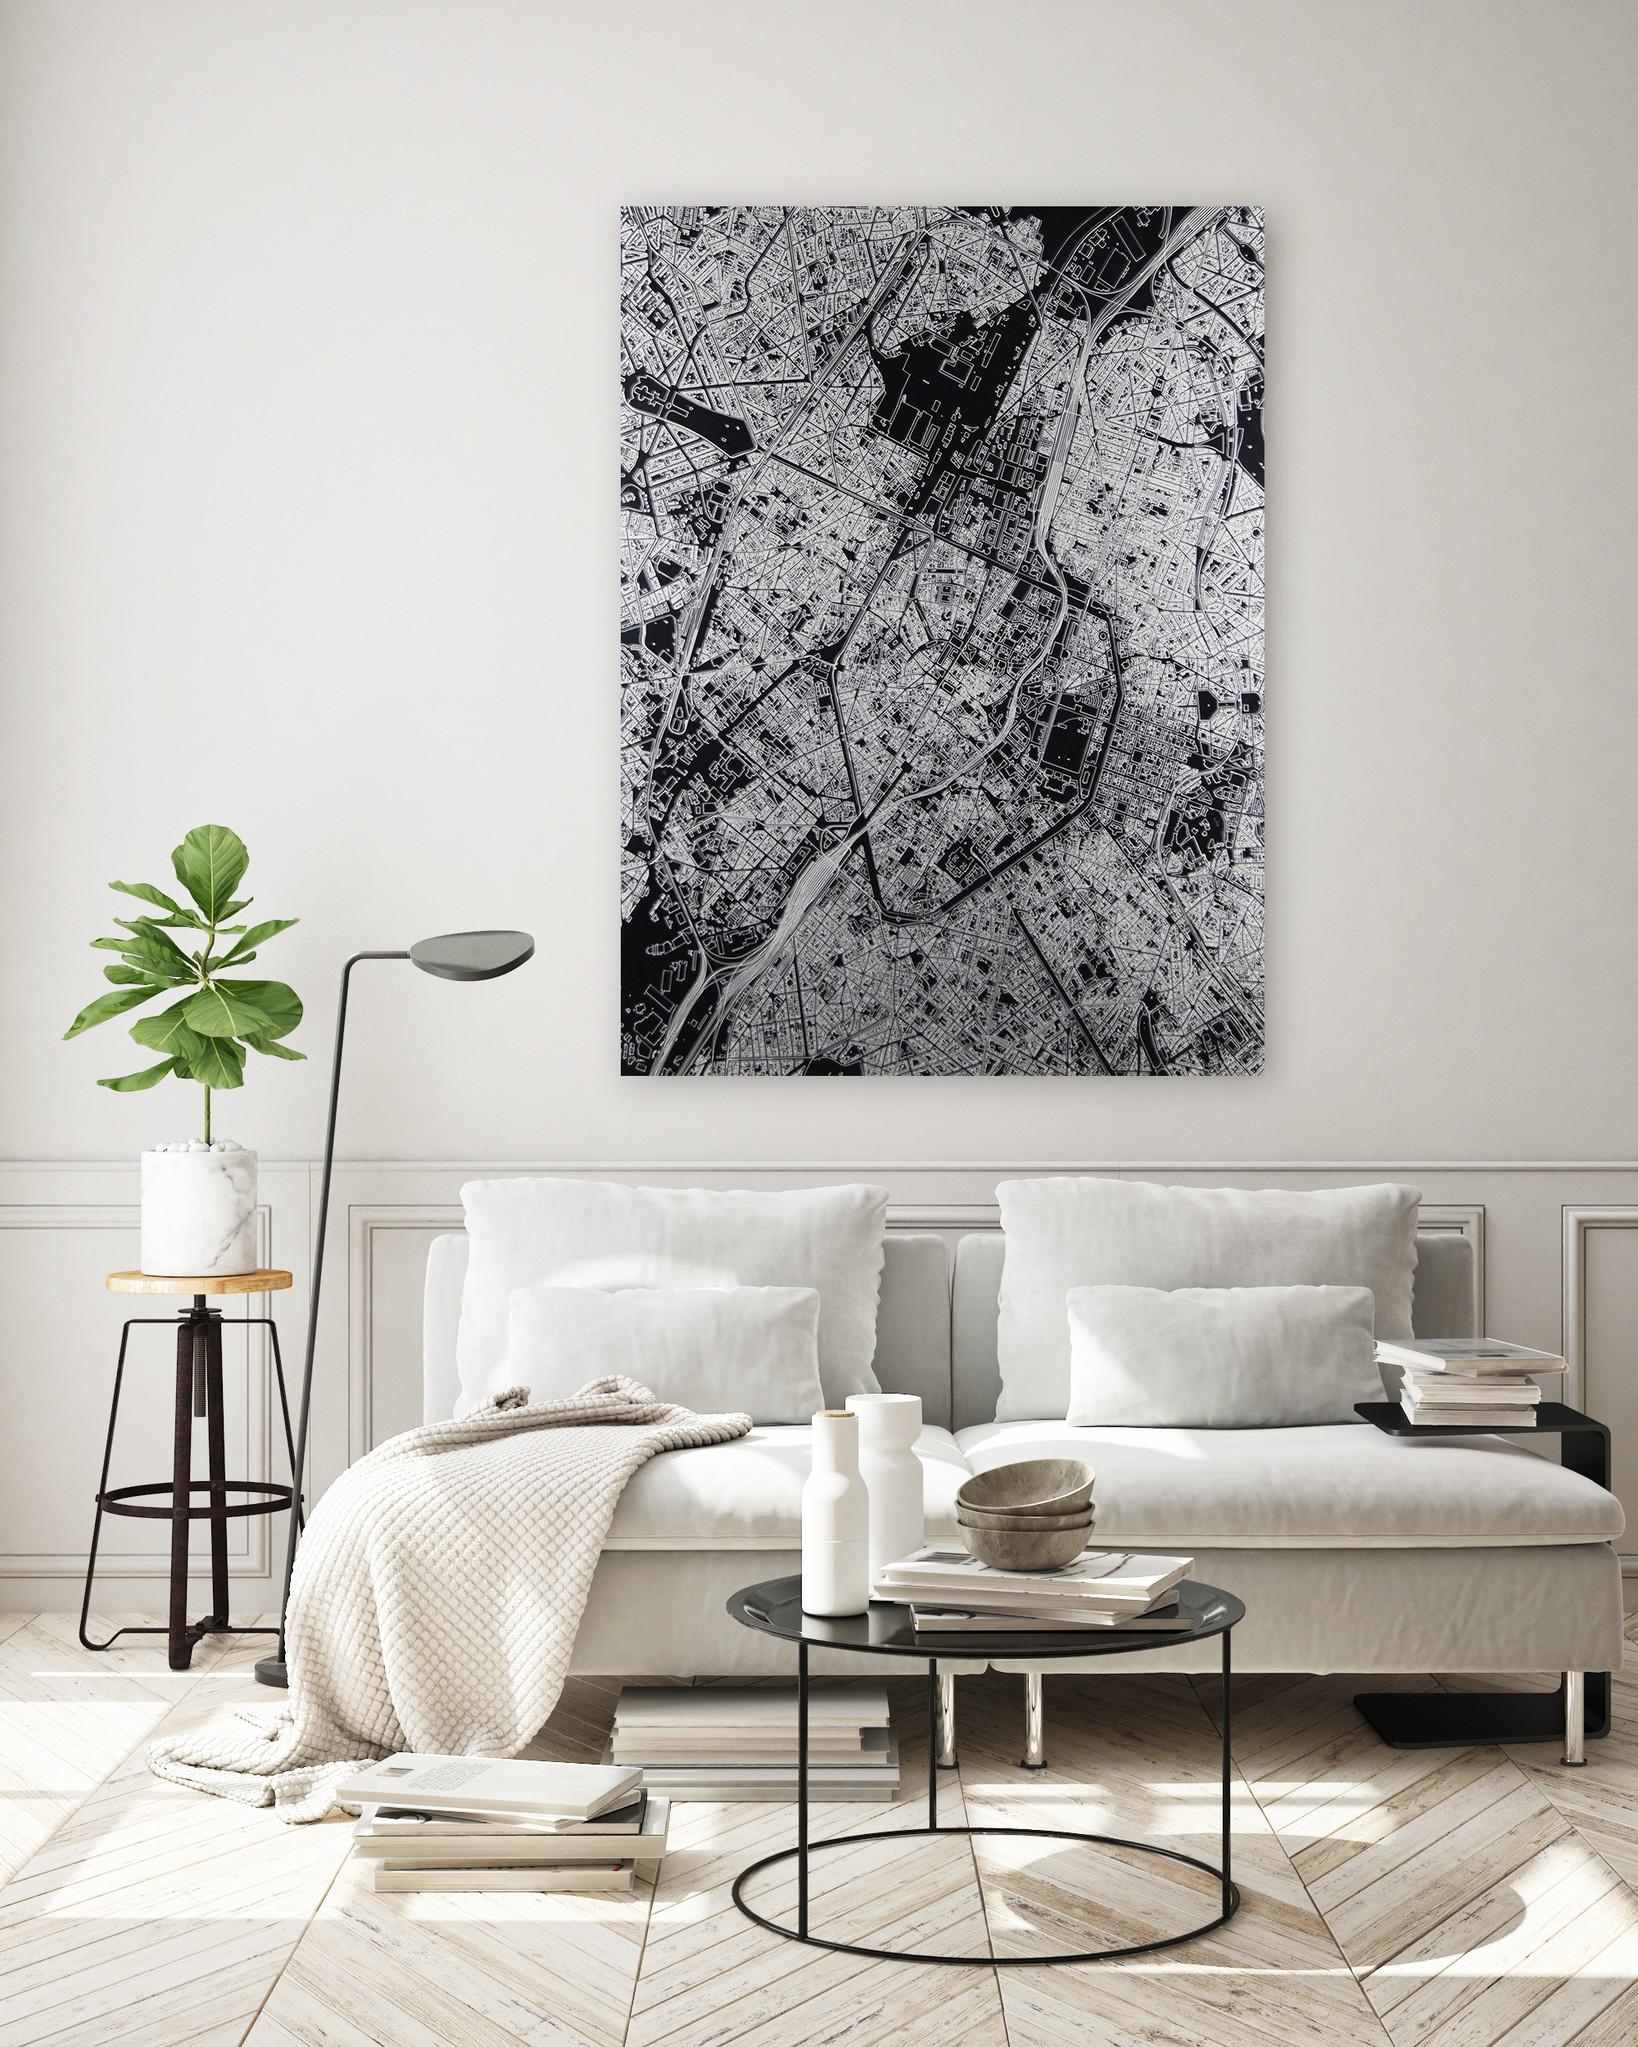 Stadtkarte Overschie | Aluminium Wanddekoration-2